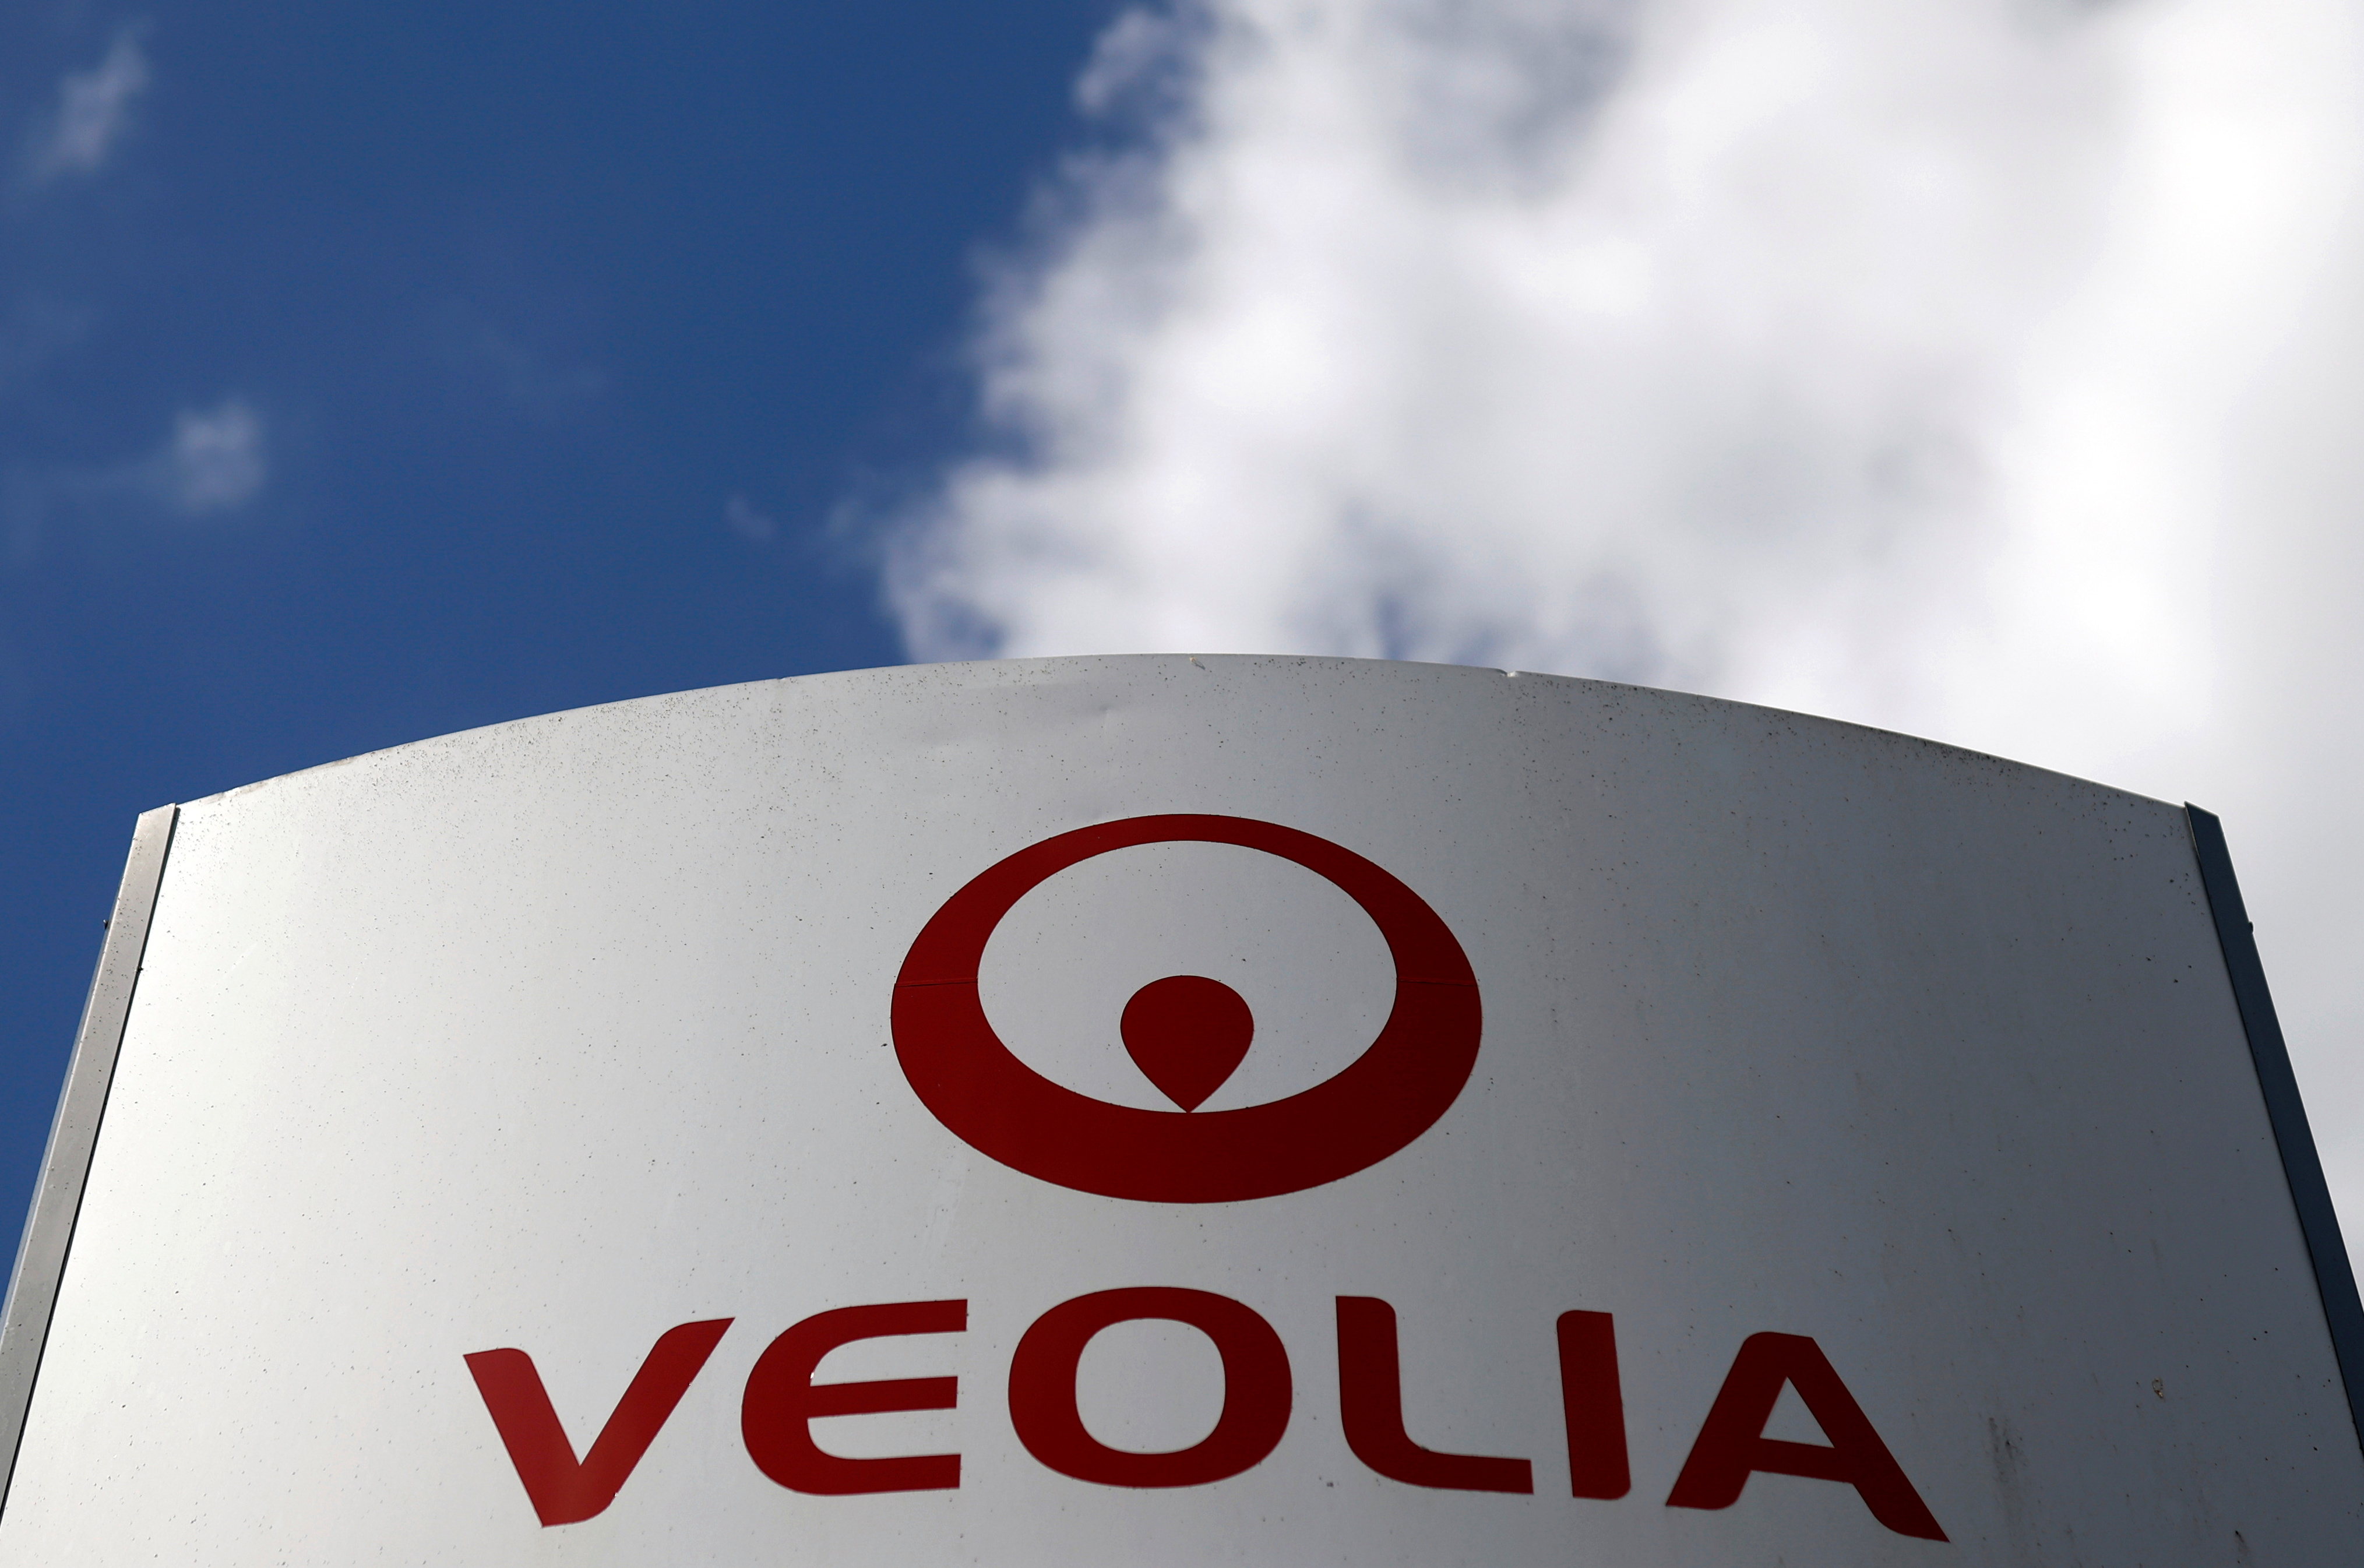 The logo of Veolia is seen in Saint-Herblain near Nantes, France, April 12, 2021. REUTERS/Stephane Mahe